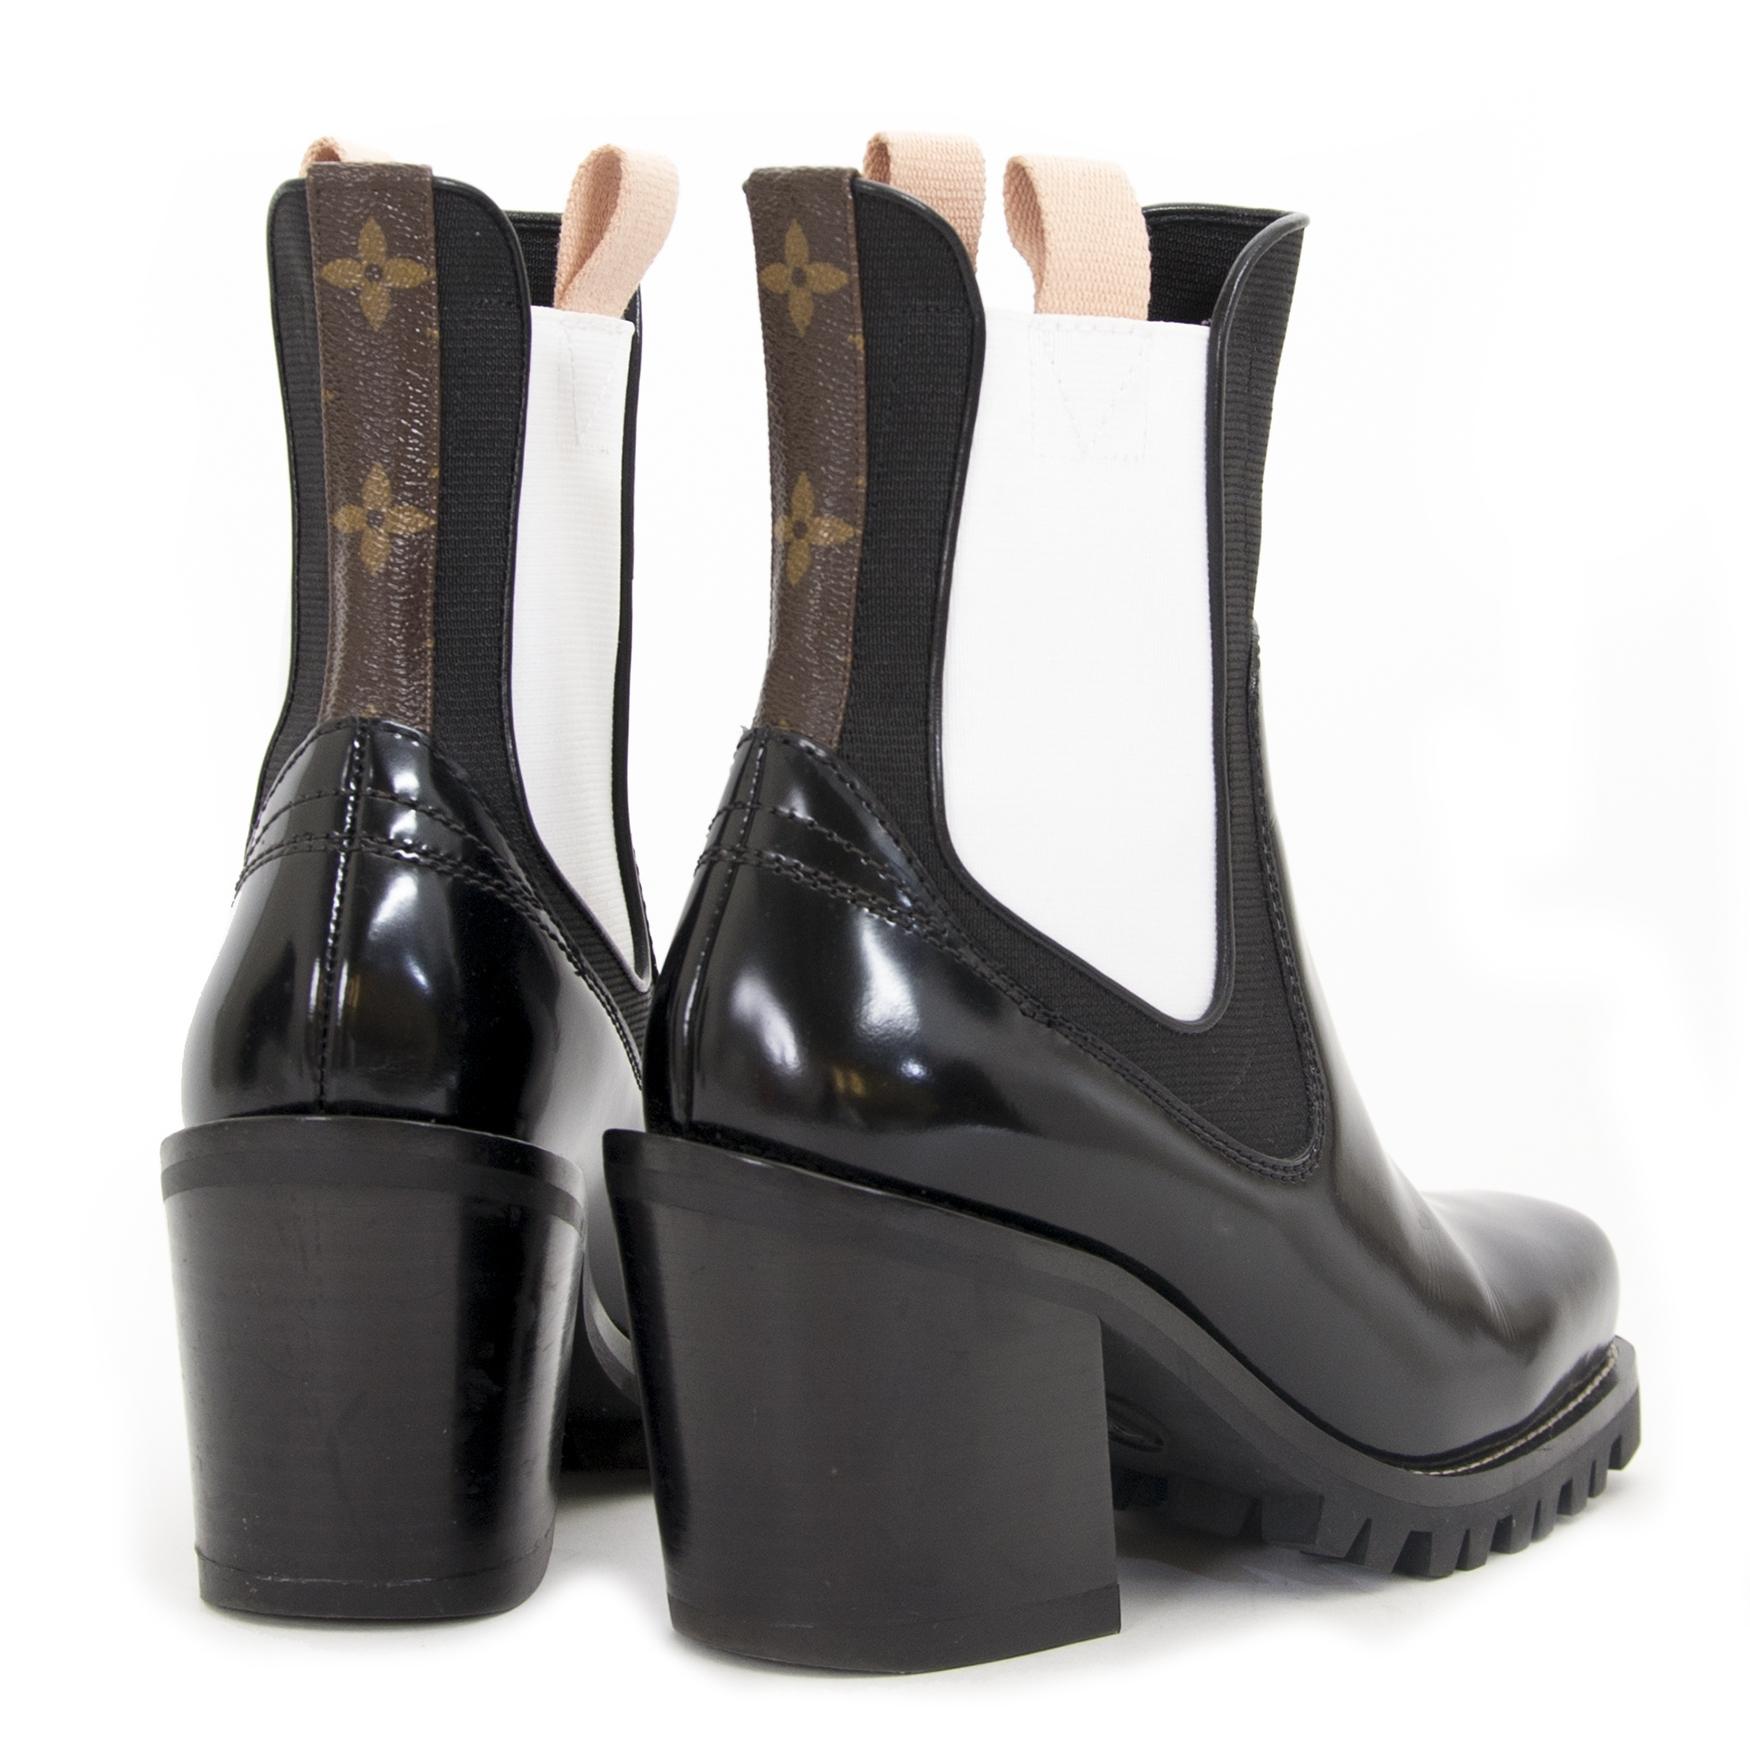 Louis Vuitton Limitless Ankle Boots te koop